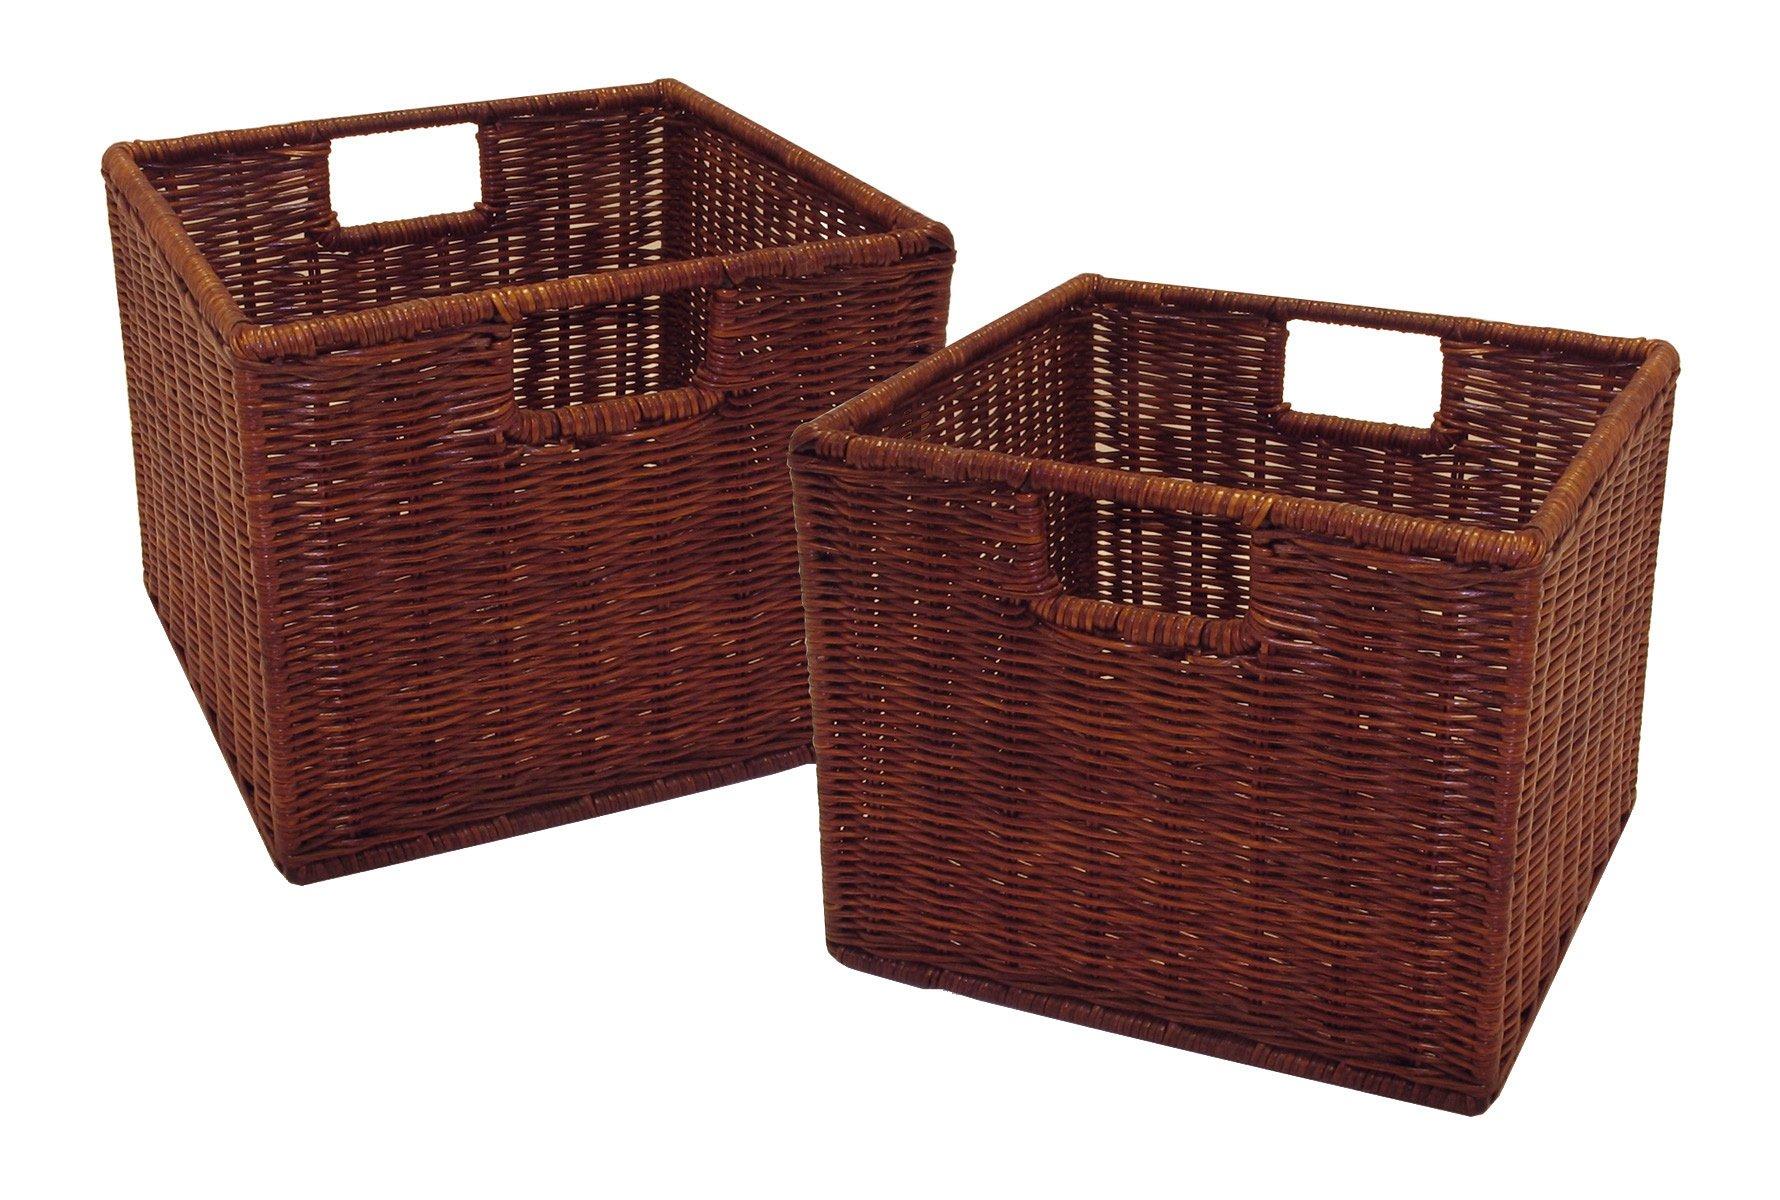 Winsome Wood Leo Storage Baskets, Set of 2,Walnut Finish